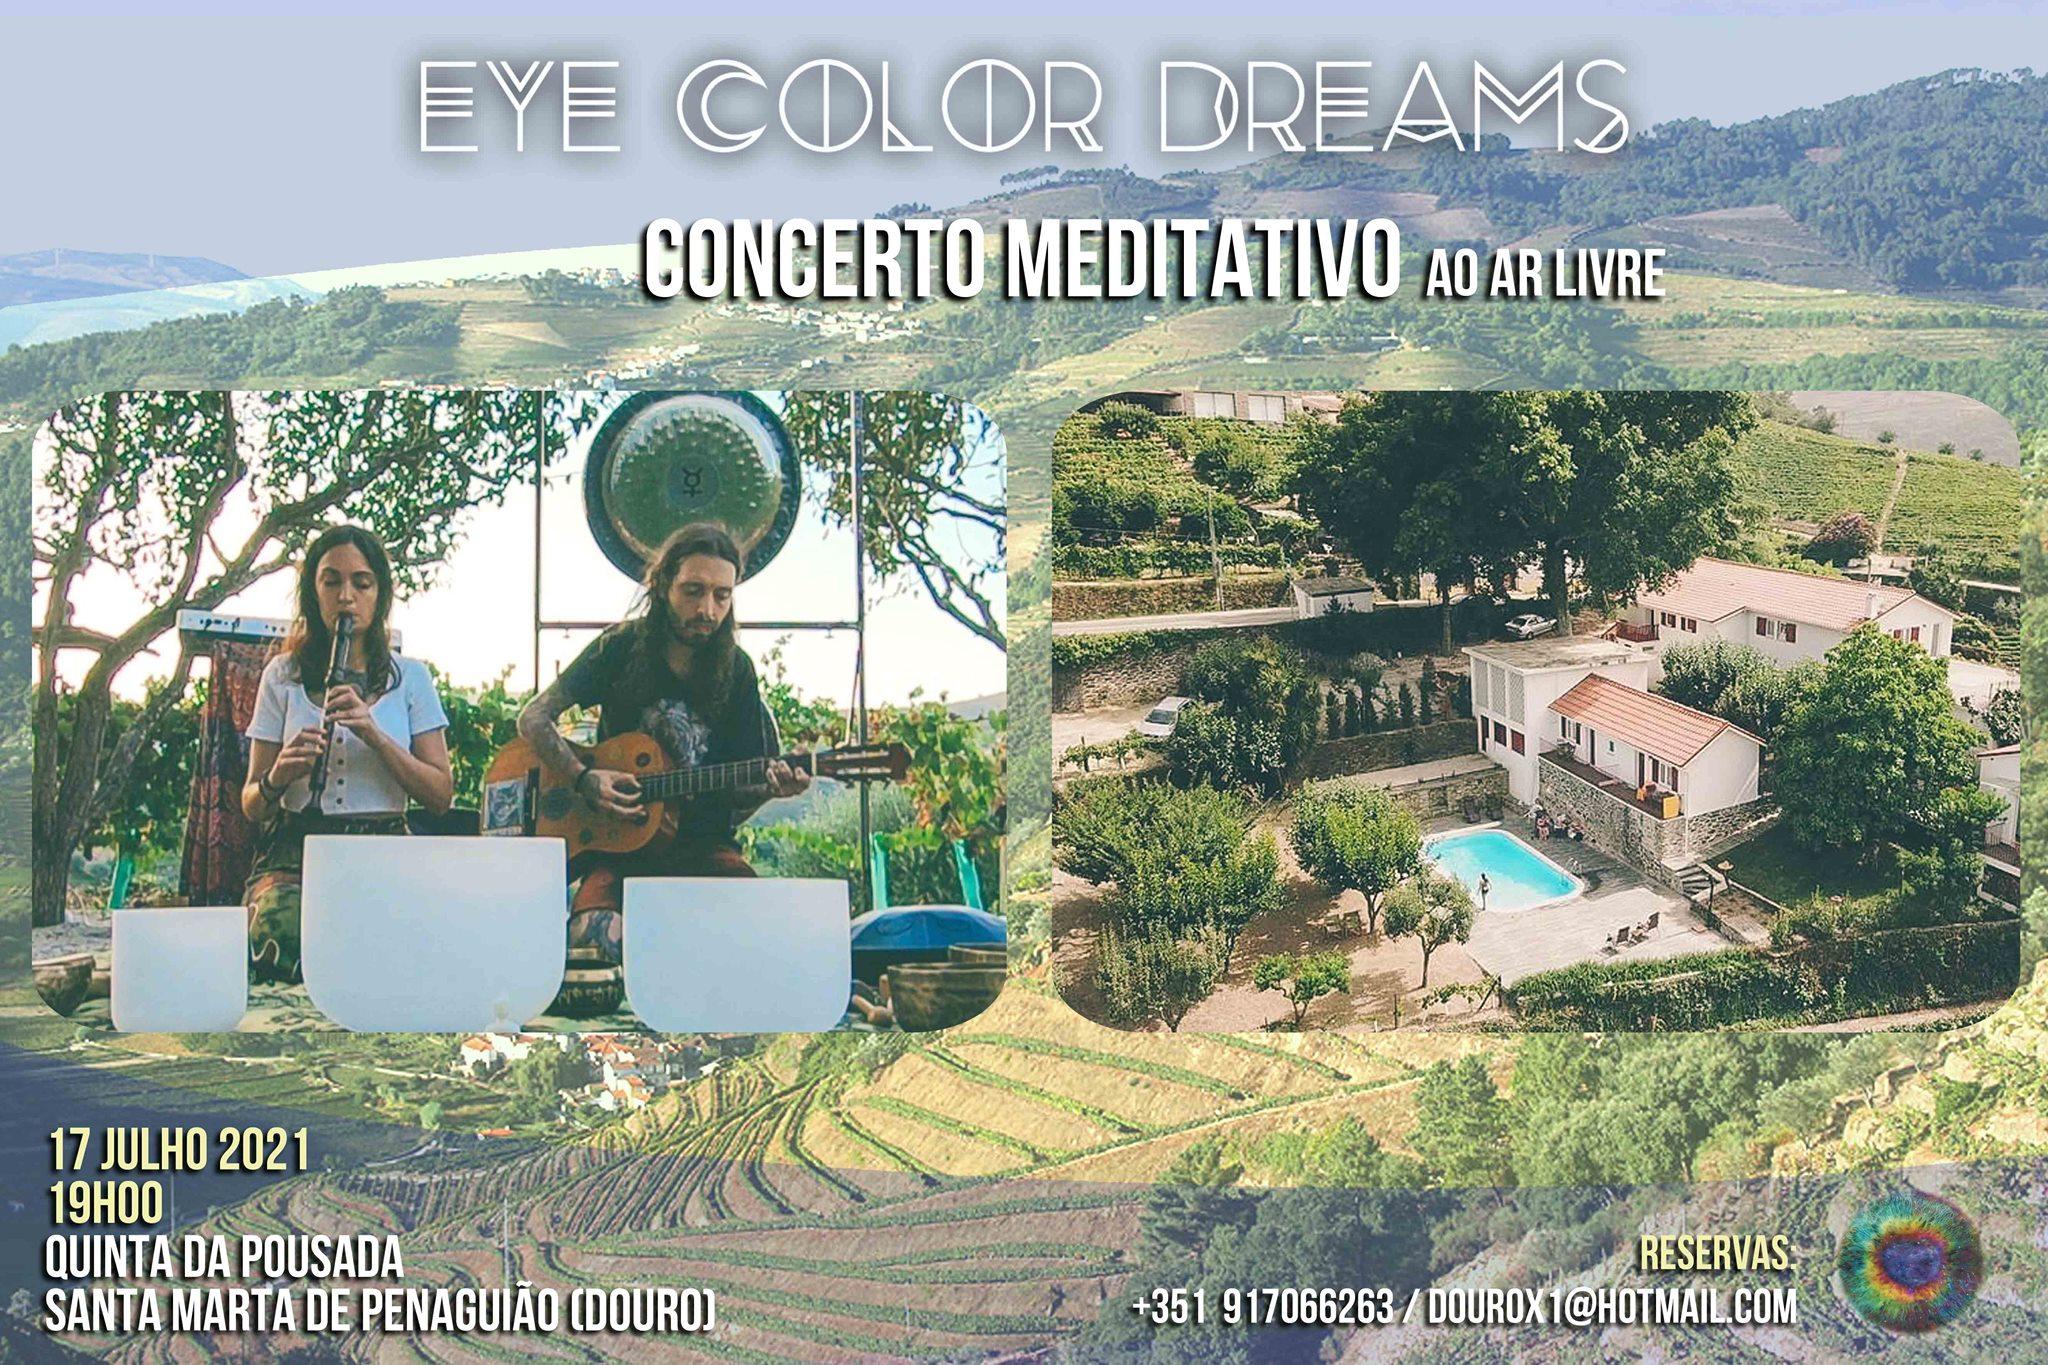 Concerto Meditativo ao ar livre - Eye Color Dreams